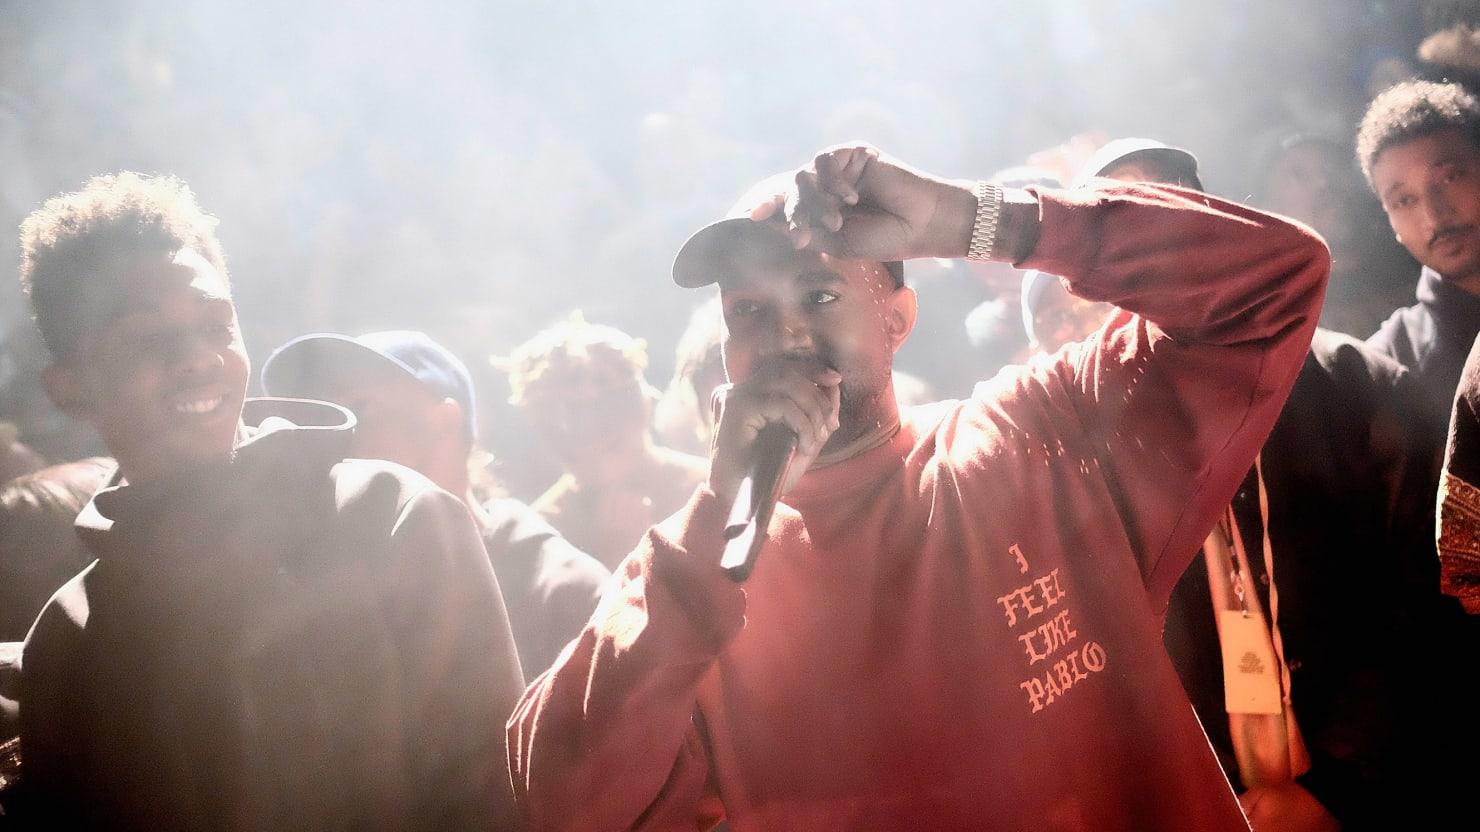 Kanye West's Full Frontal Assault on Fashion